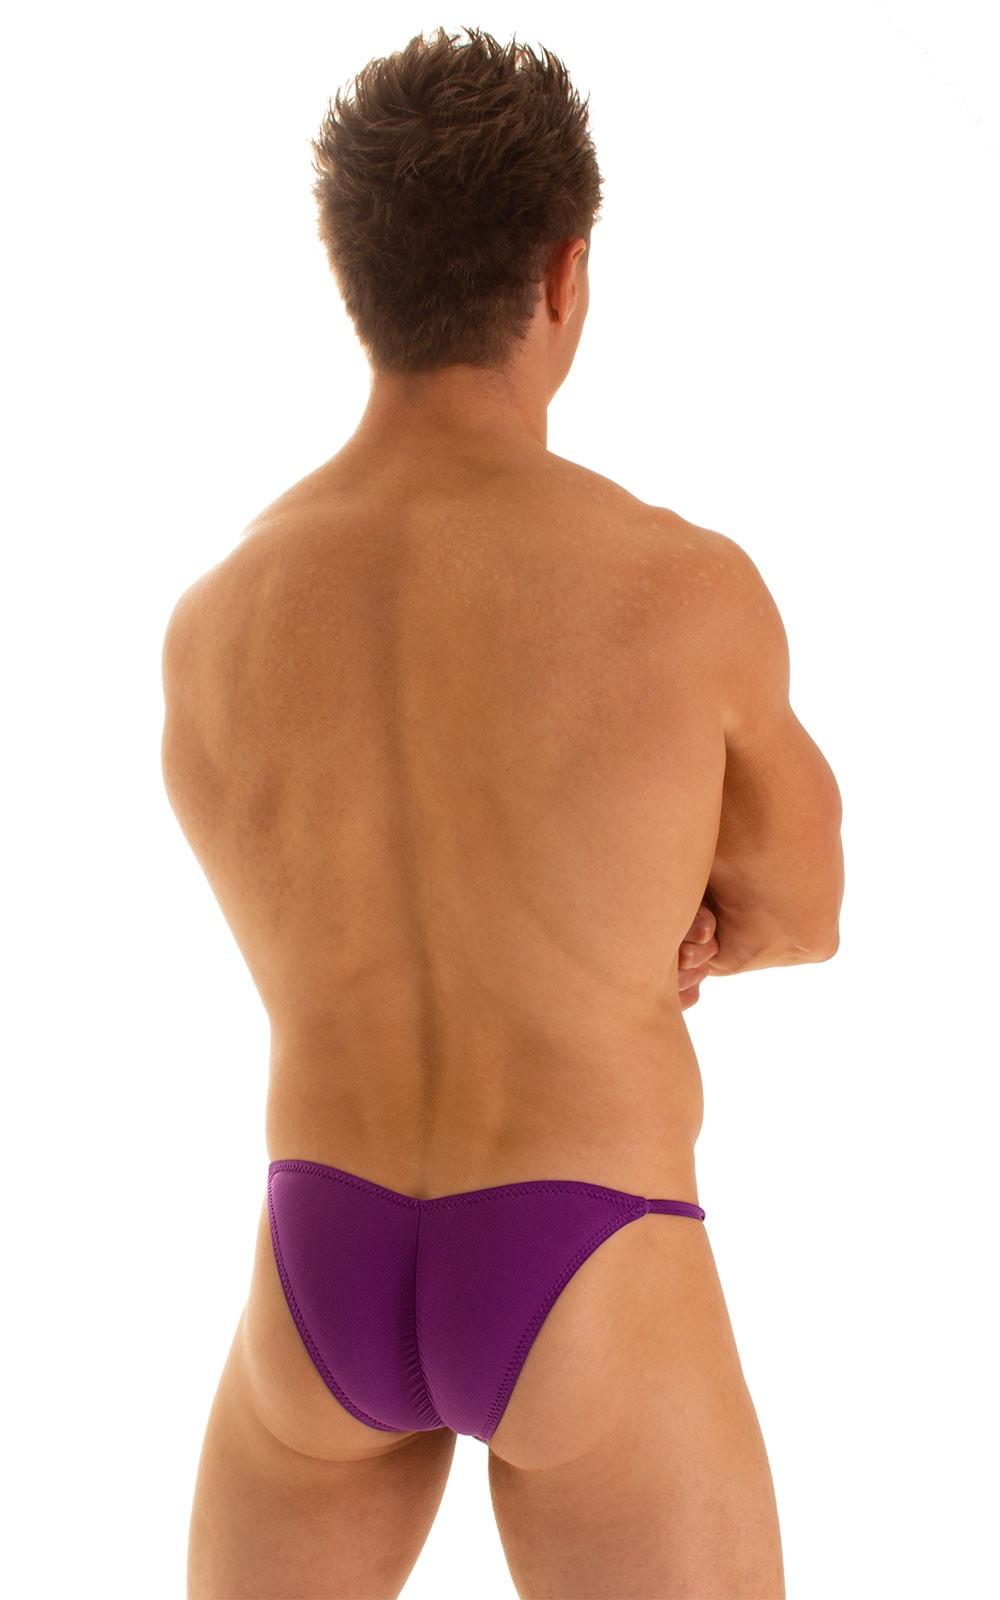 Micro Pouch - Puckered Back - Rio Bikini in ThinSkinz Grape 2